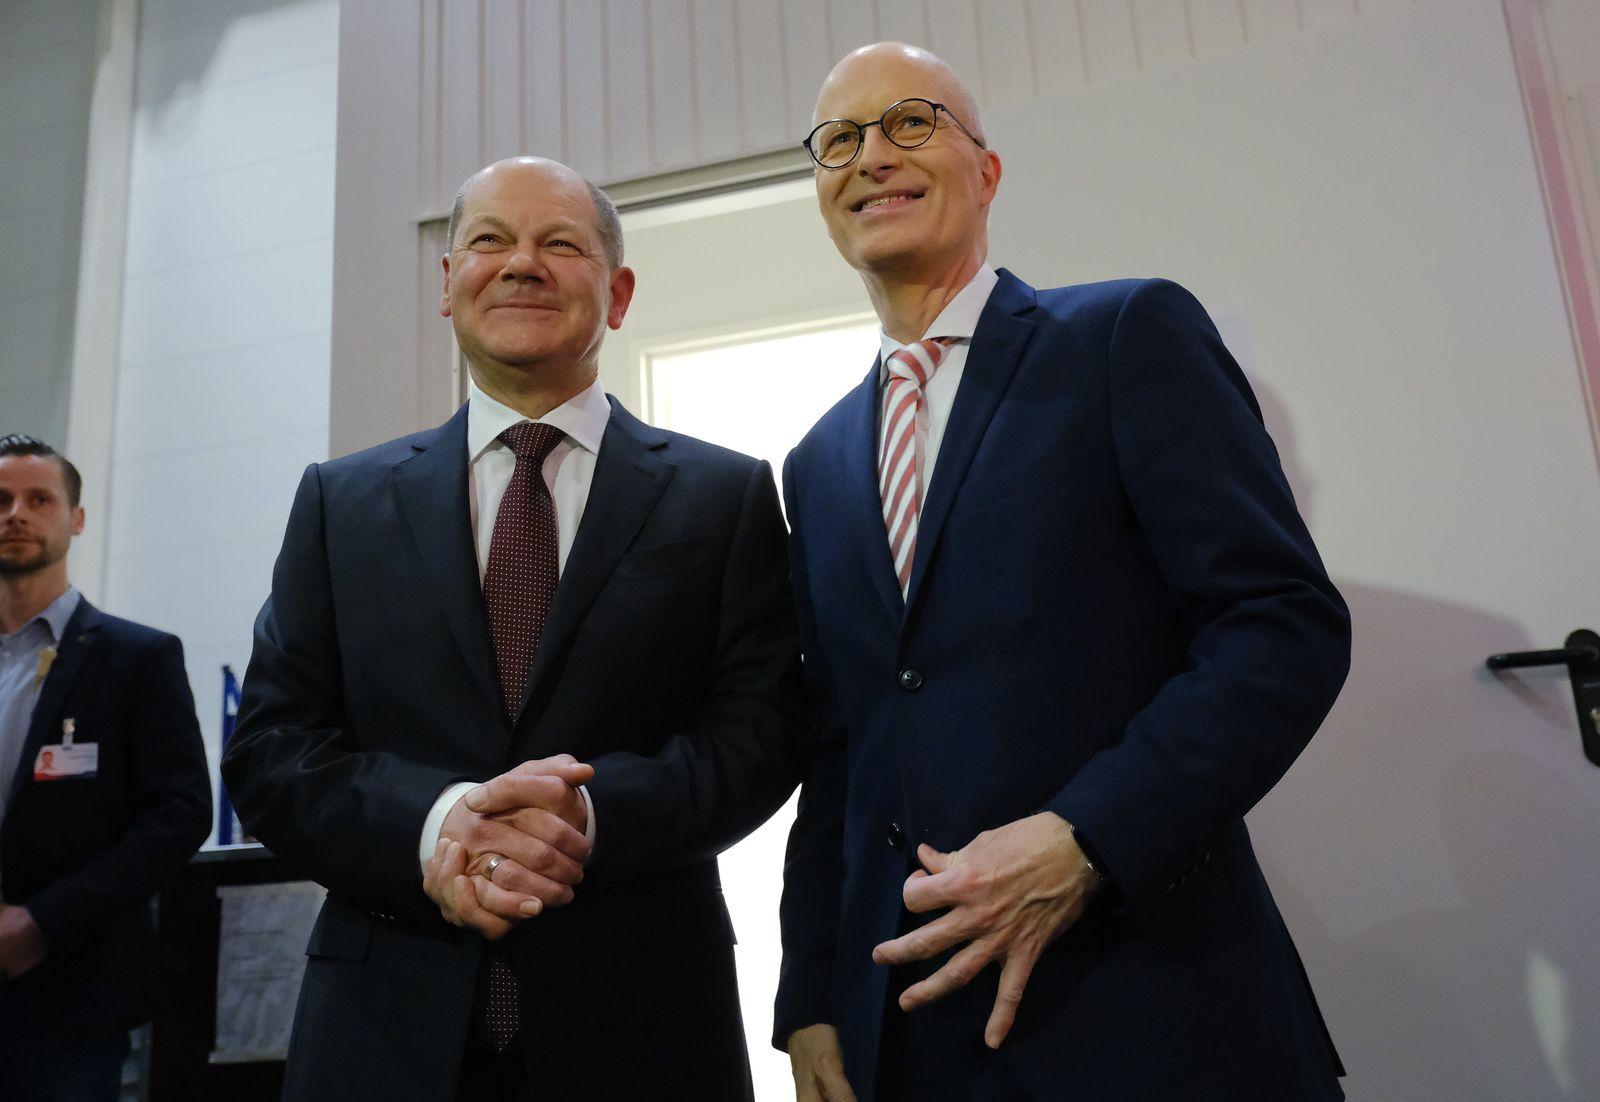 Hamburg Holds City Elections